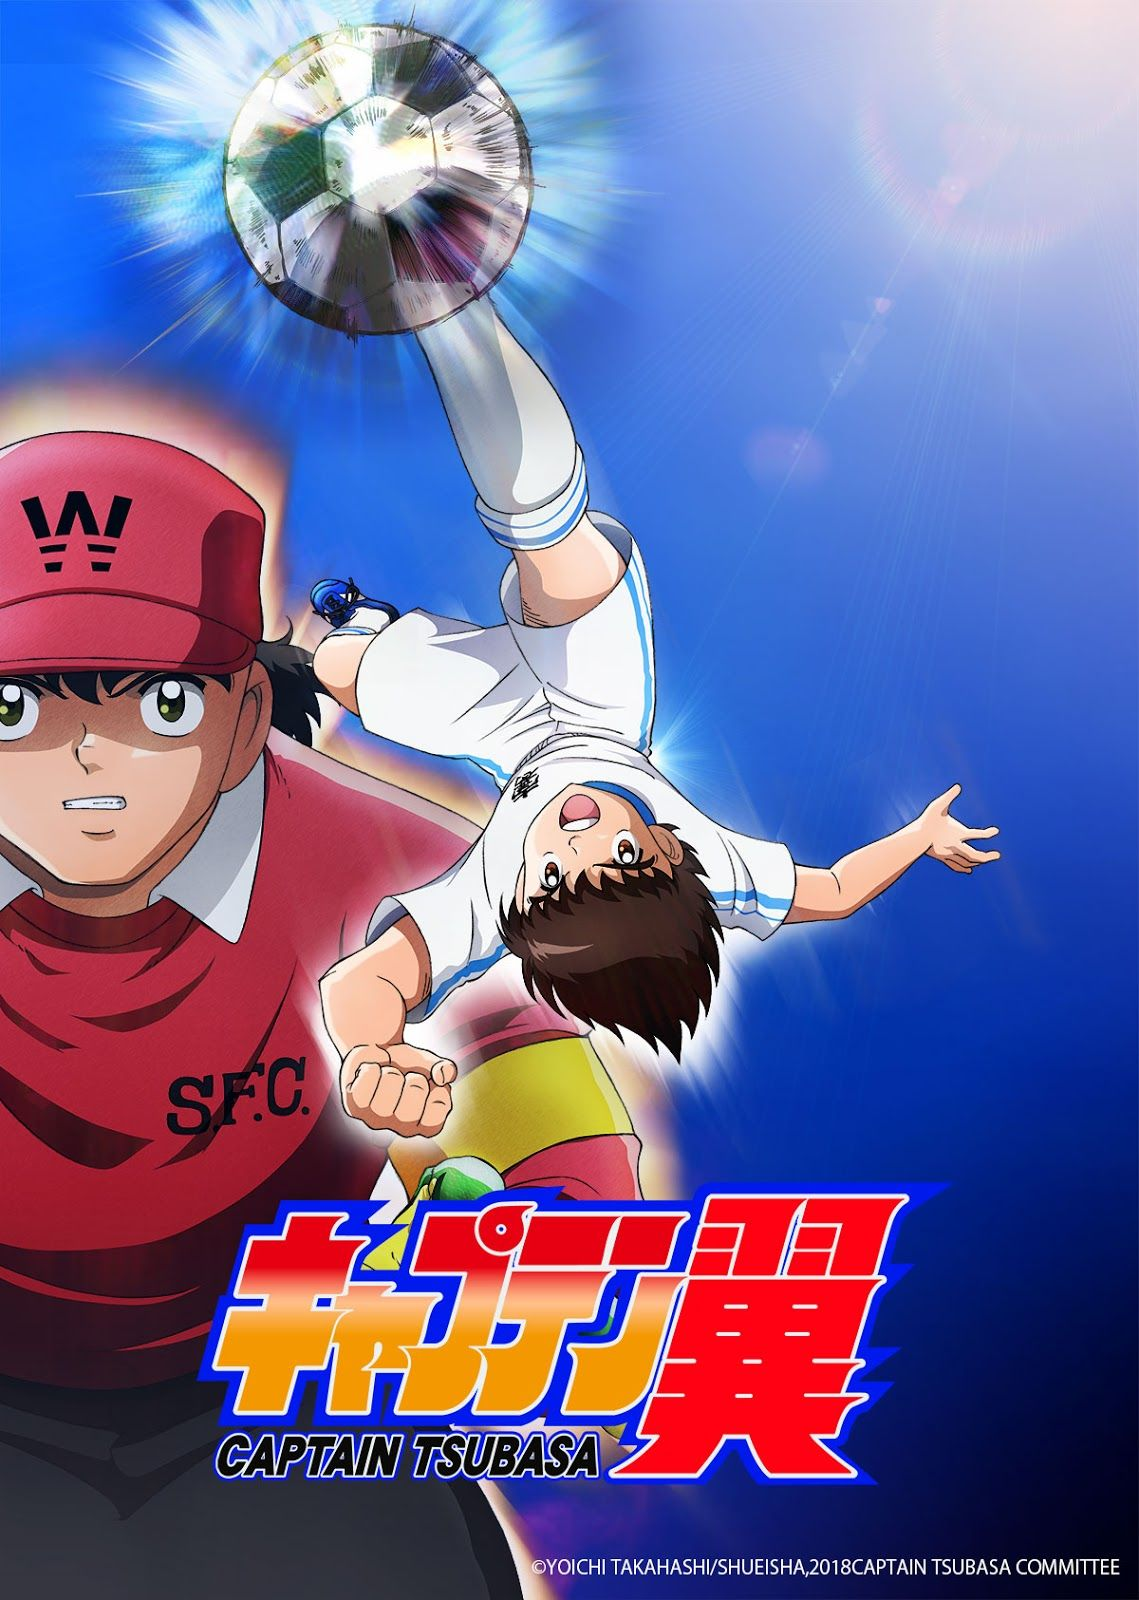 All About Anime, Manga, Games and Stuff Teman, Indonesia